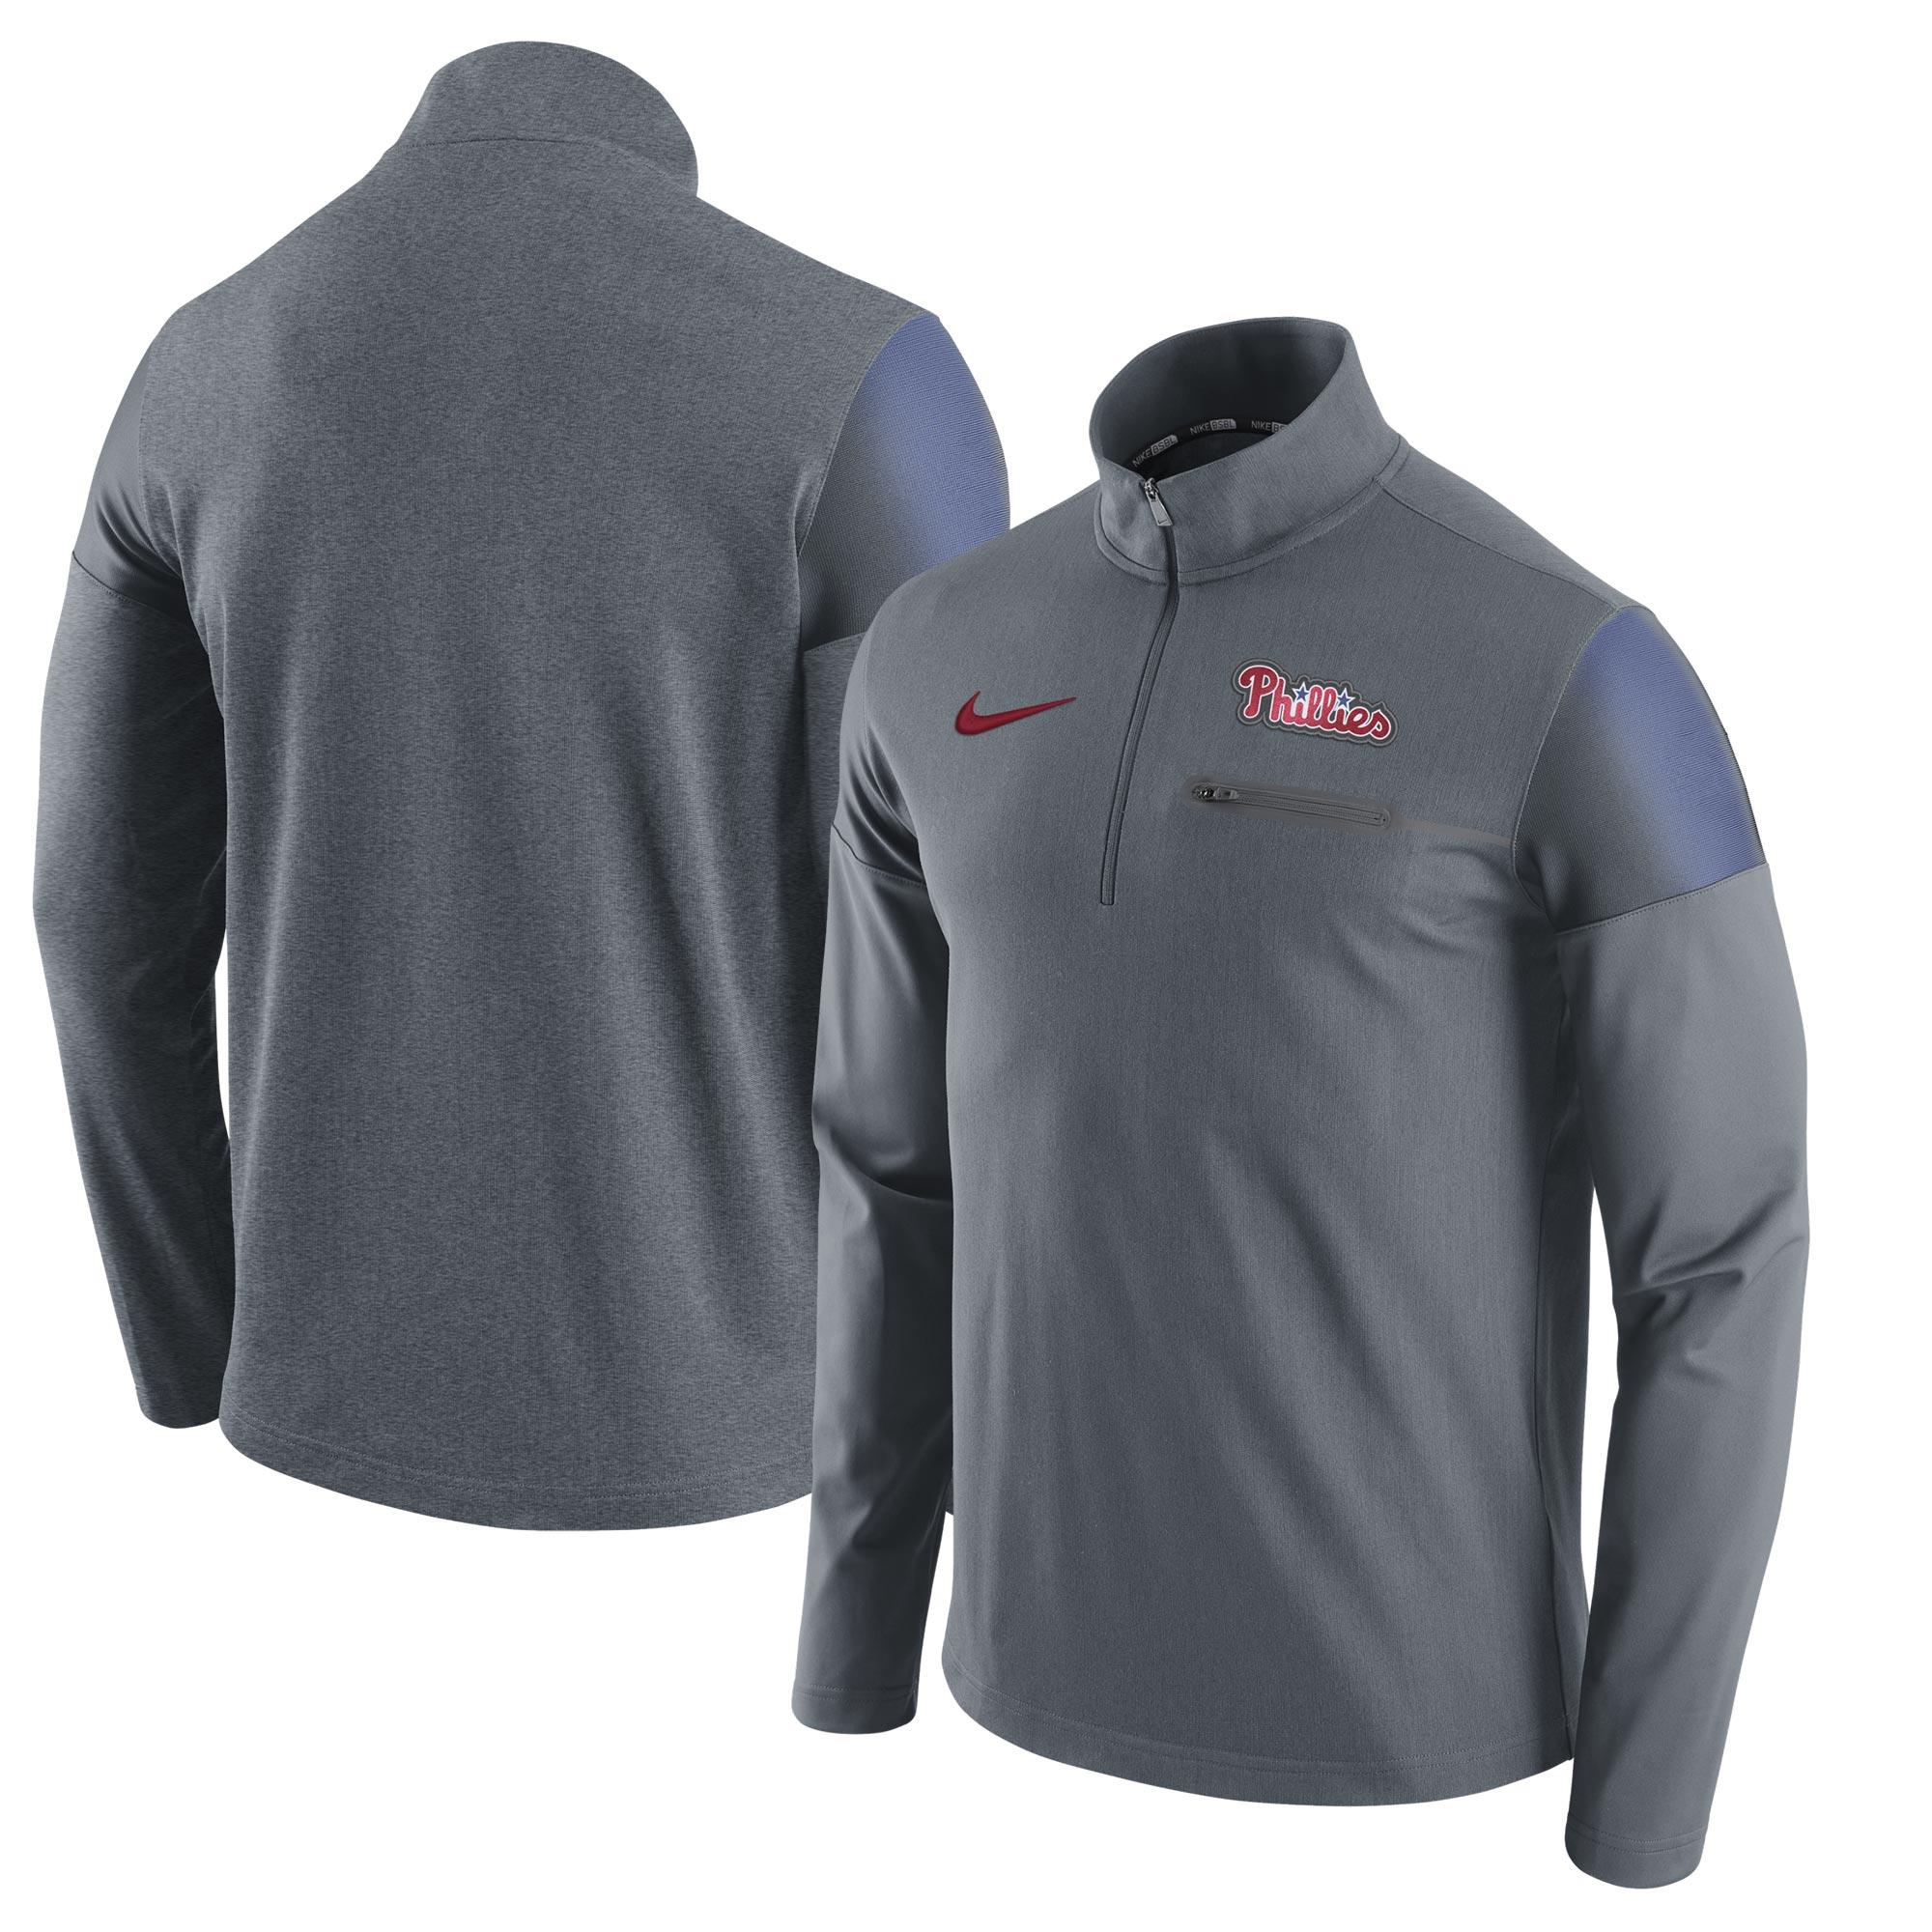 Philadelphia Phillies Nike Elite Half-Zip Pullover Jacket - Gray